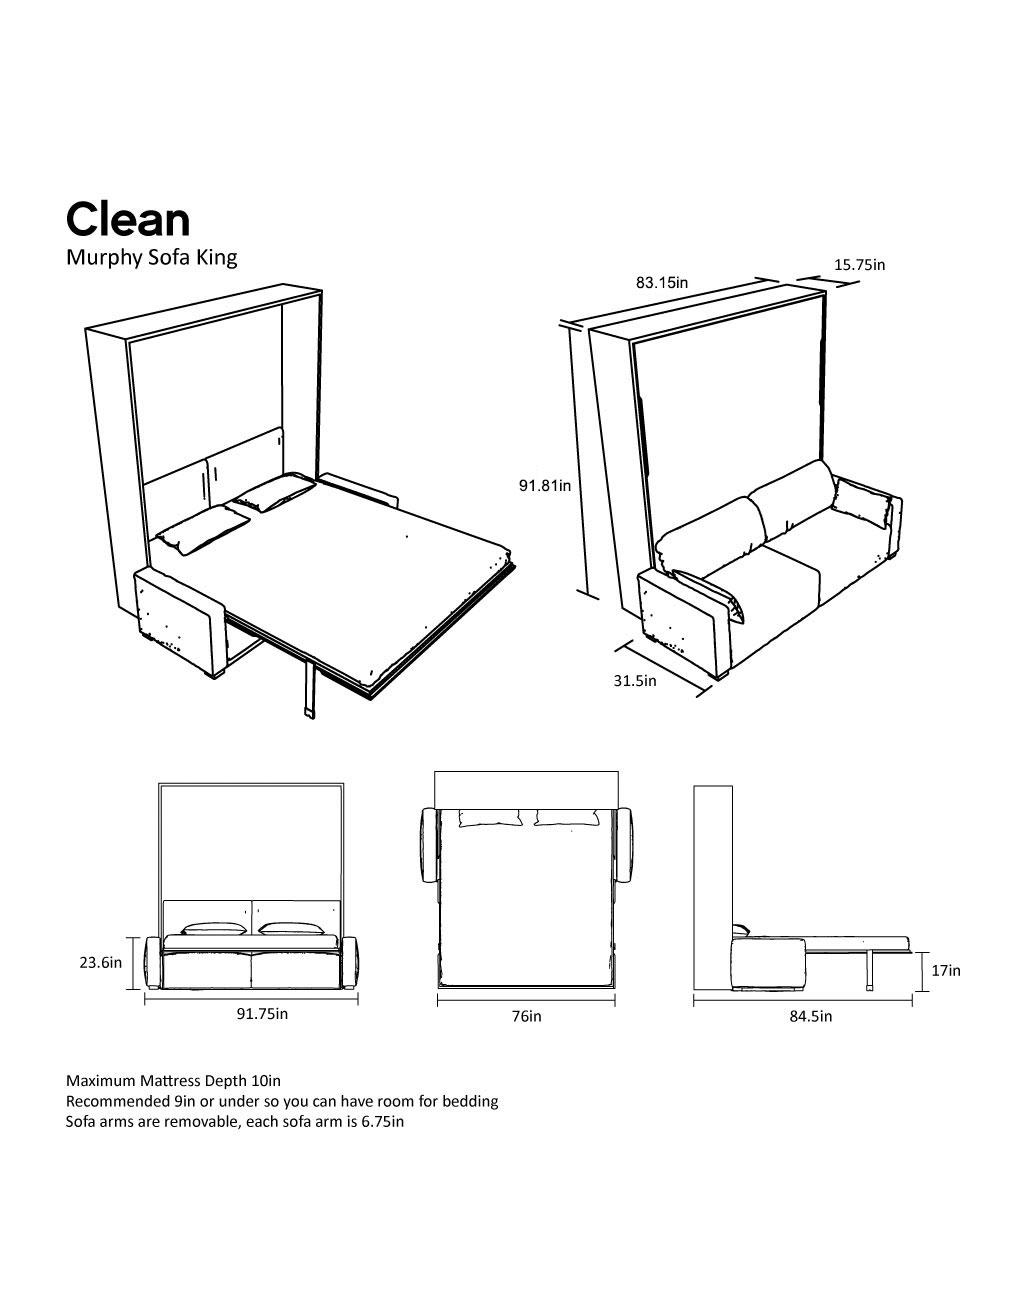 murphysofa Dimensions wall bed clean king